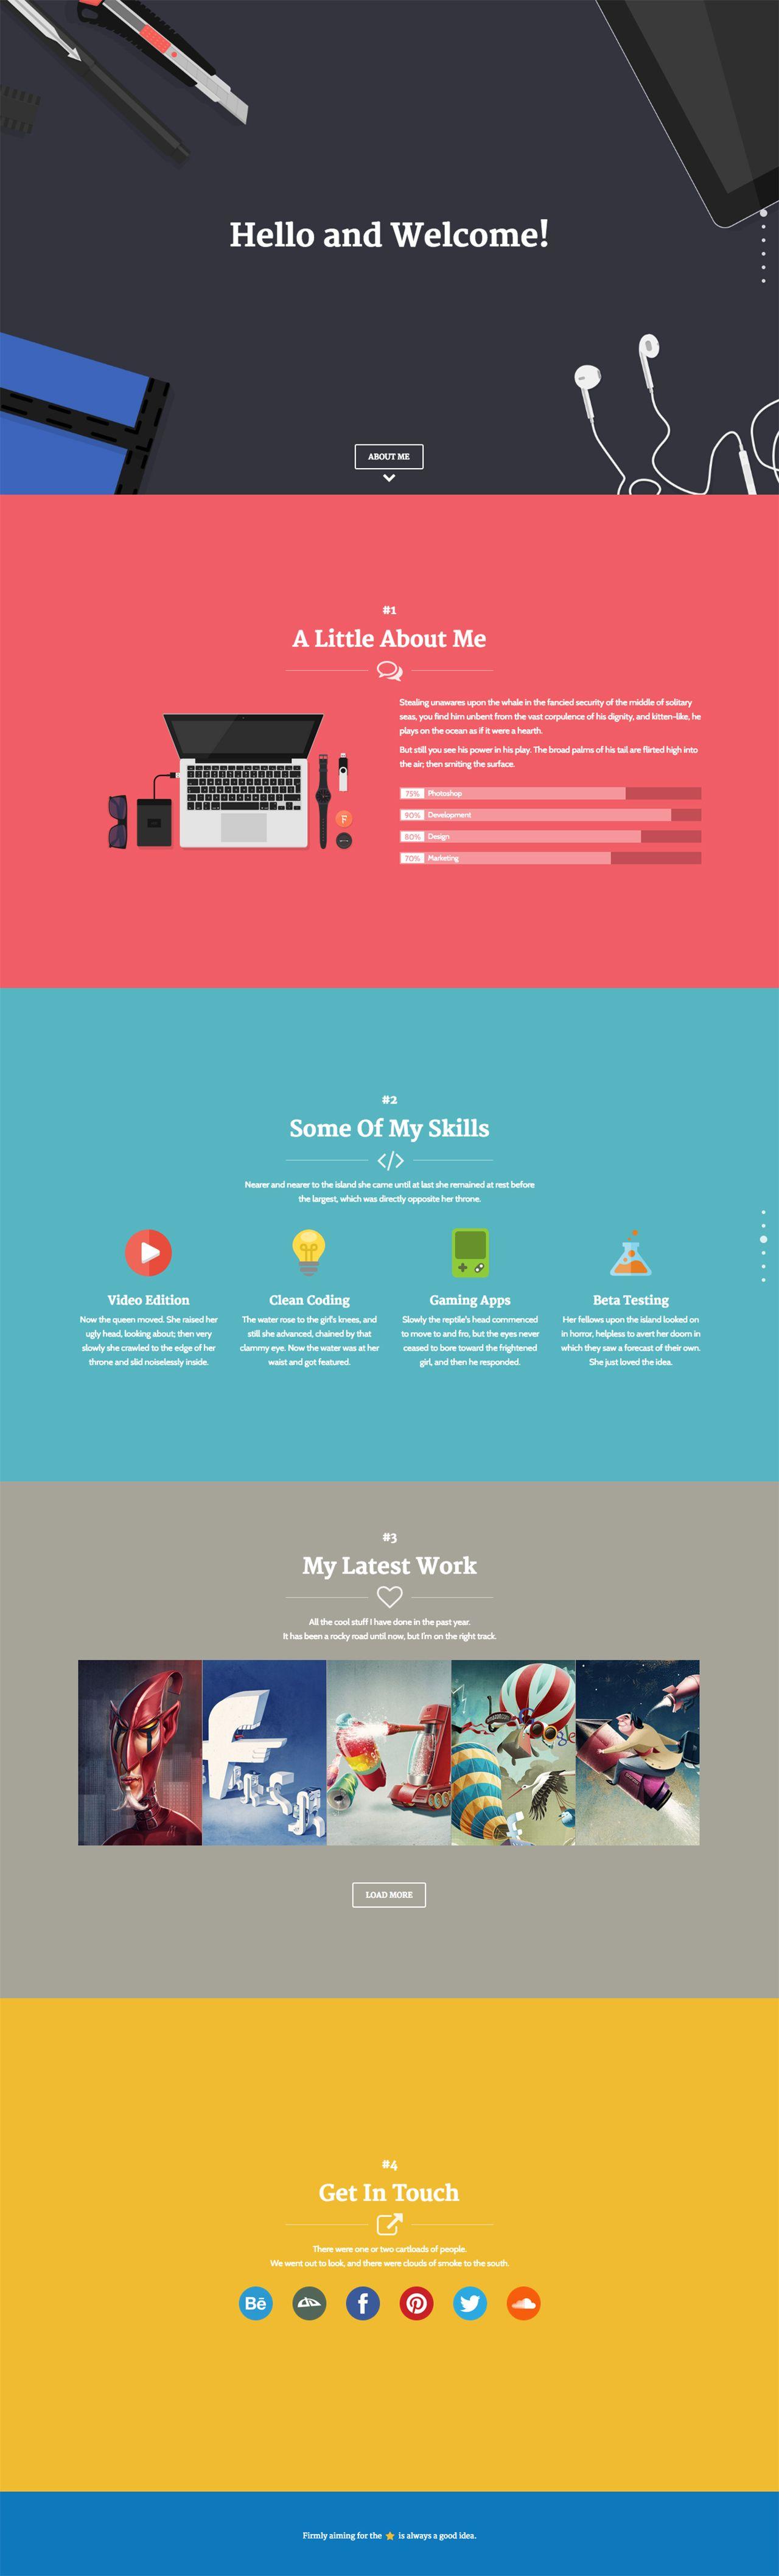 Alchemy Interactive - Award winning responsive web design ...